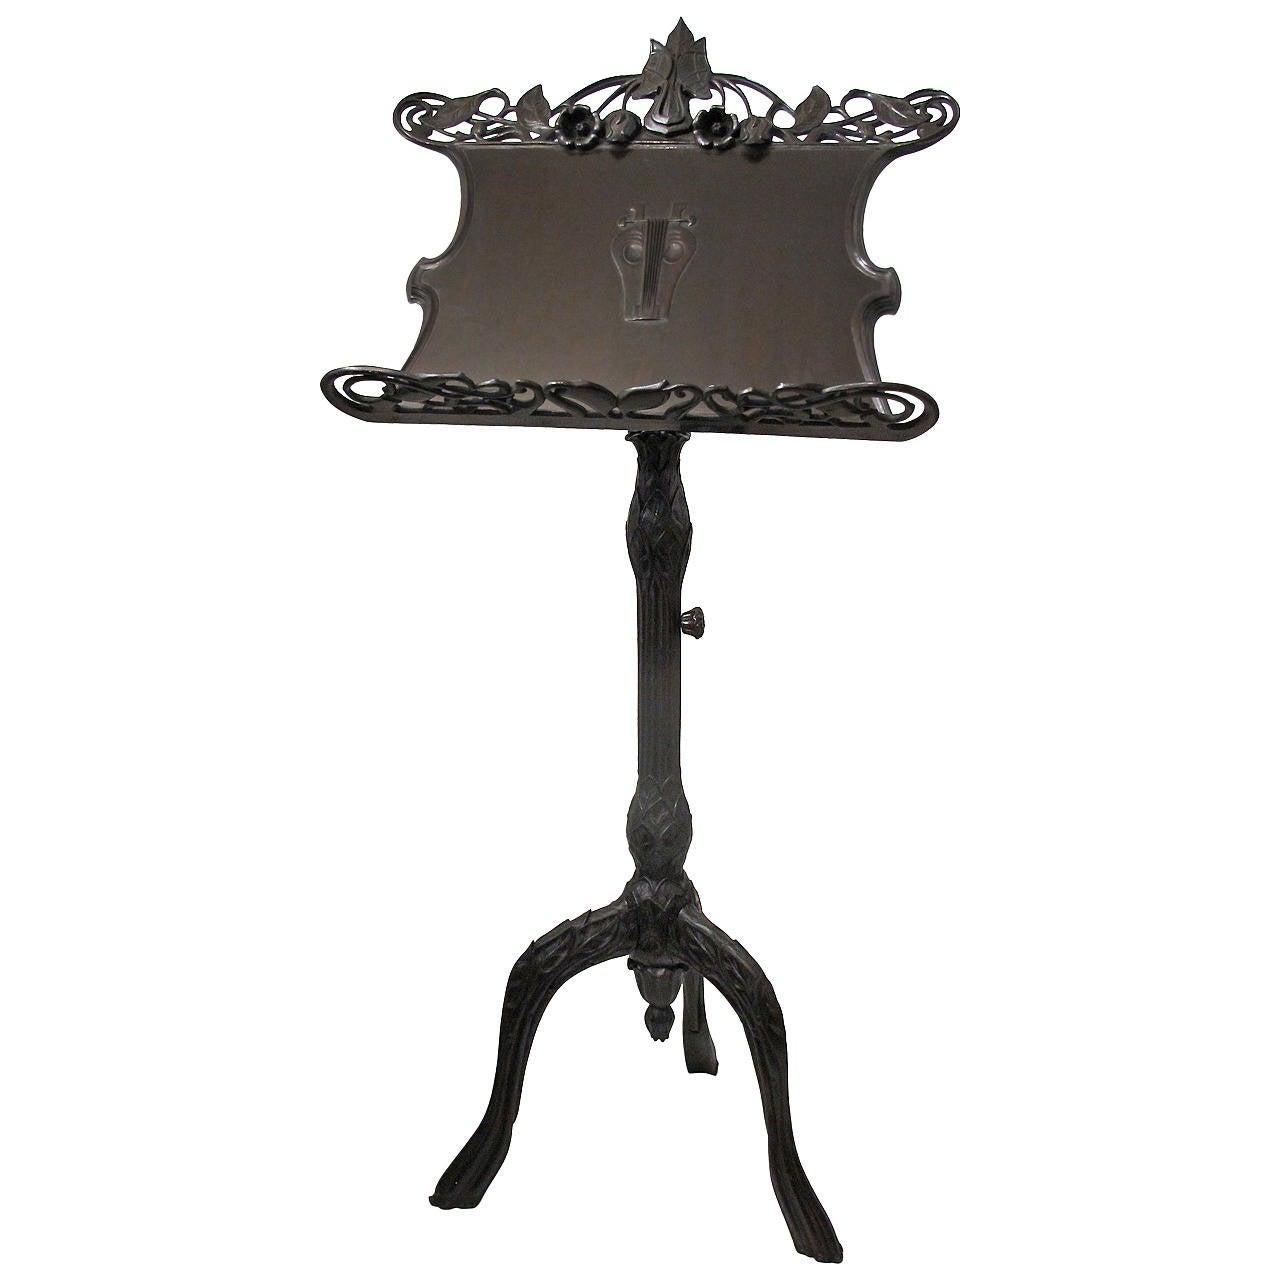 art nouveau music stand for sale at 1stdibs. Black Bedroom Furniture Sets. Home Design Ideas